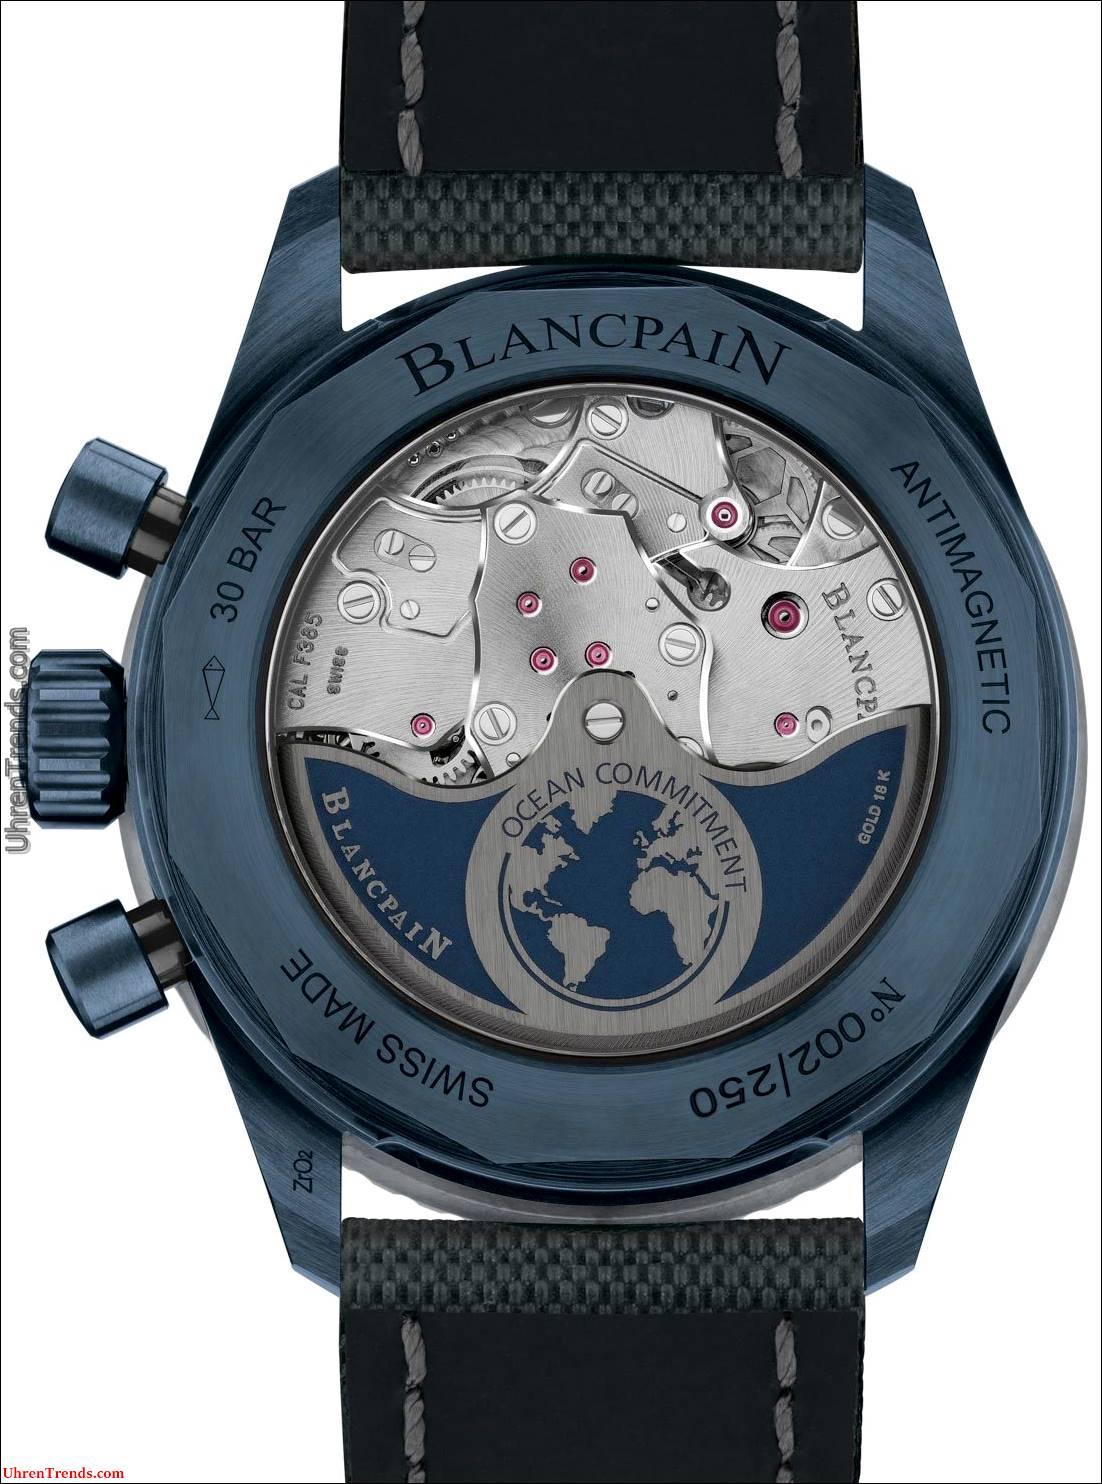 Blancpain Fifty Fathoms Bathyscaphe Flyback Chronograph Ocean Commitment II Jetzt im blauen Keramikgehäuse